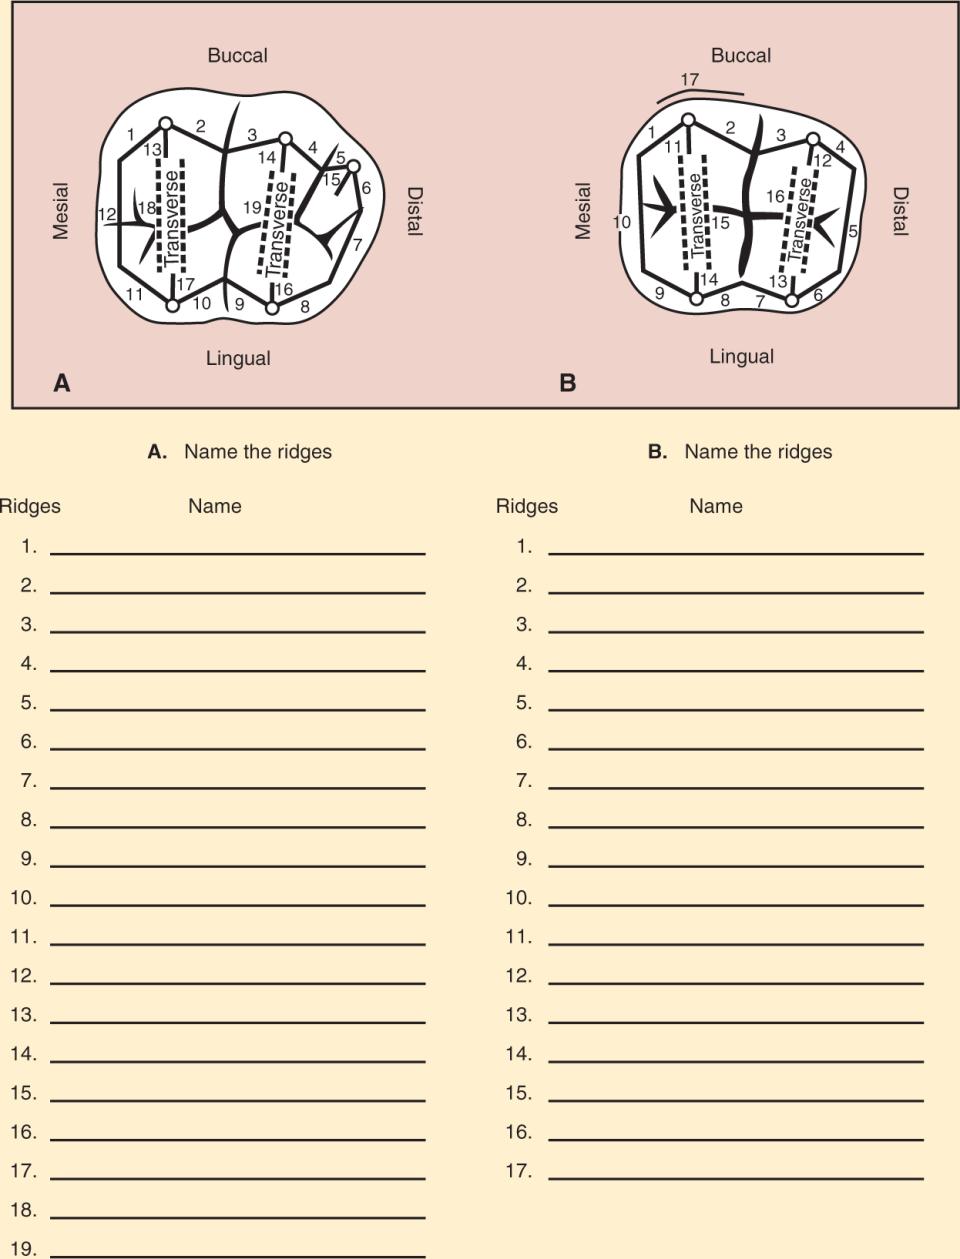 An illustration and a photo show maxillary molar